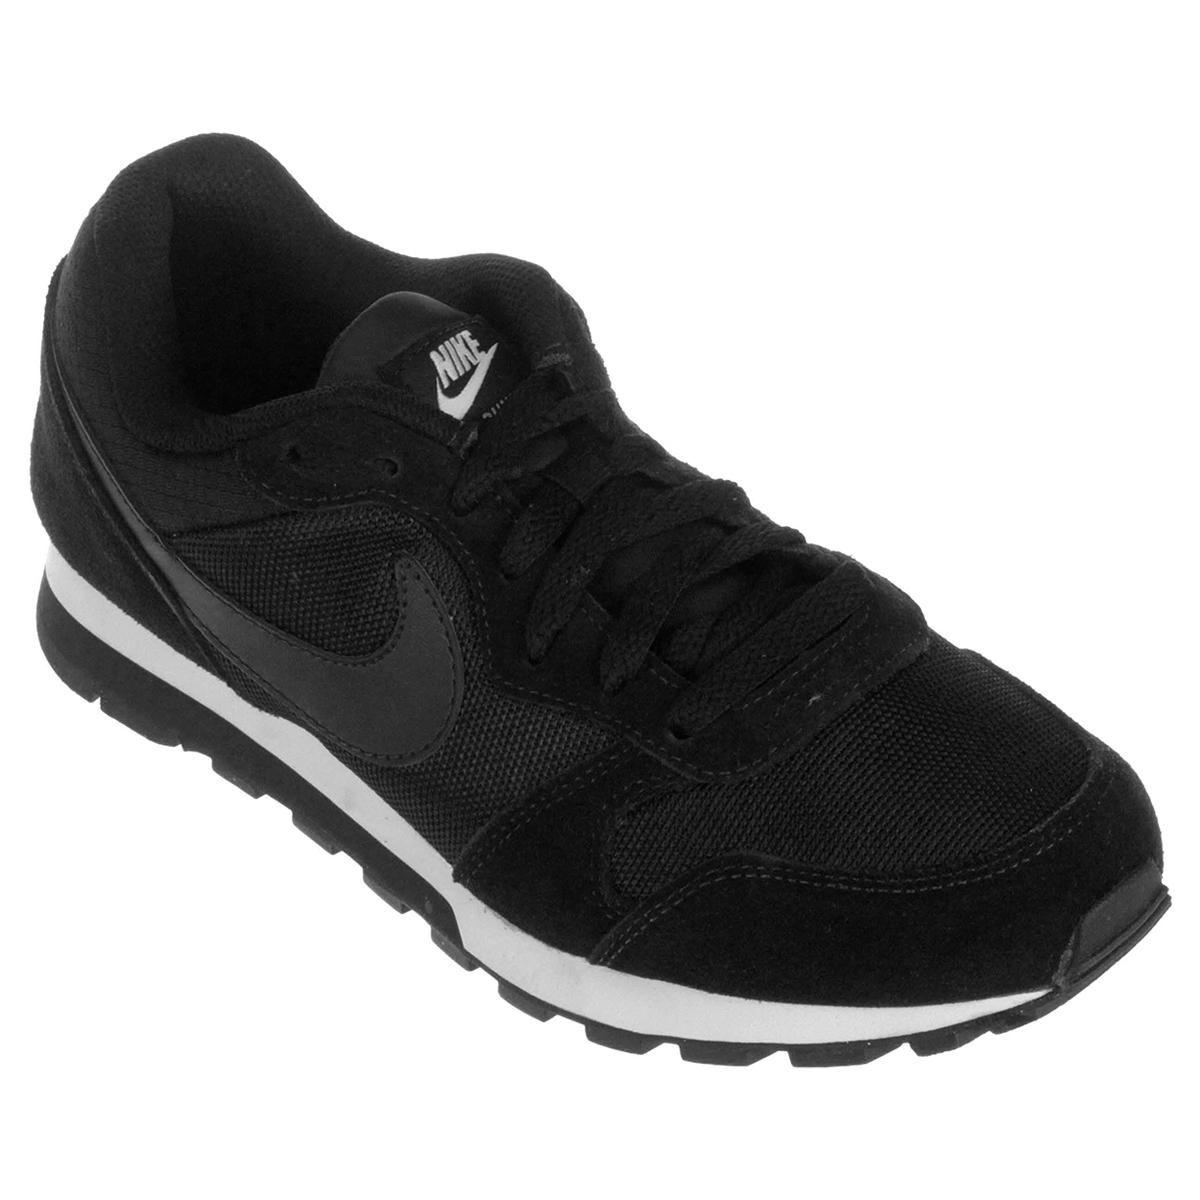 b6ef6256e4 Tênis Feminino Nike Md Runner 2 - BRACIA SHOP  Loja de Roupas ...